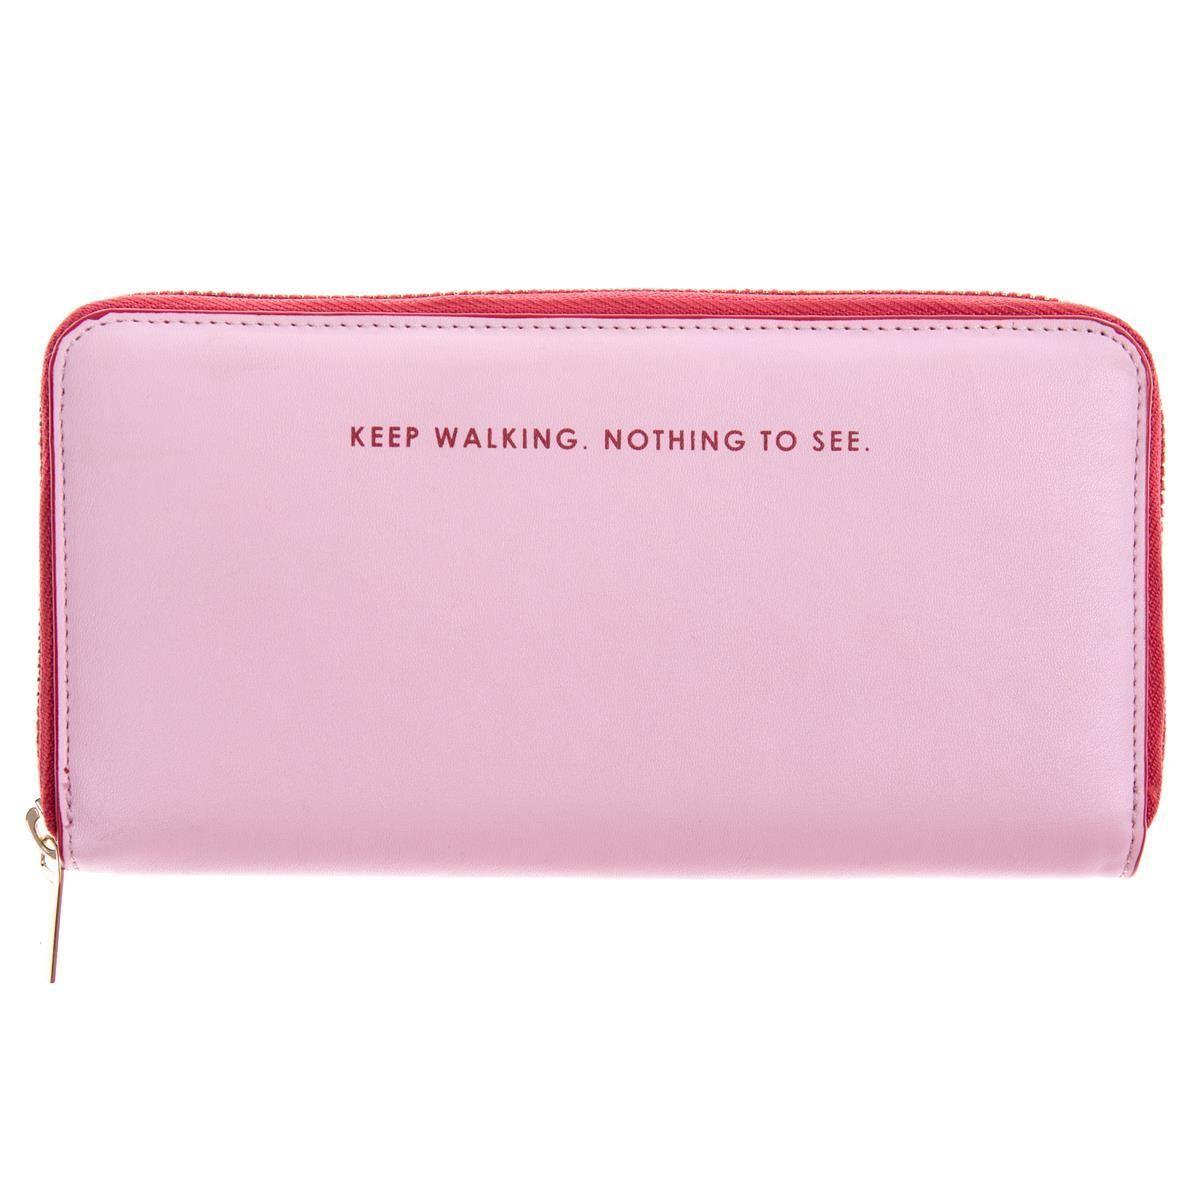 Keep walking nothing to see pink and red ziparound